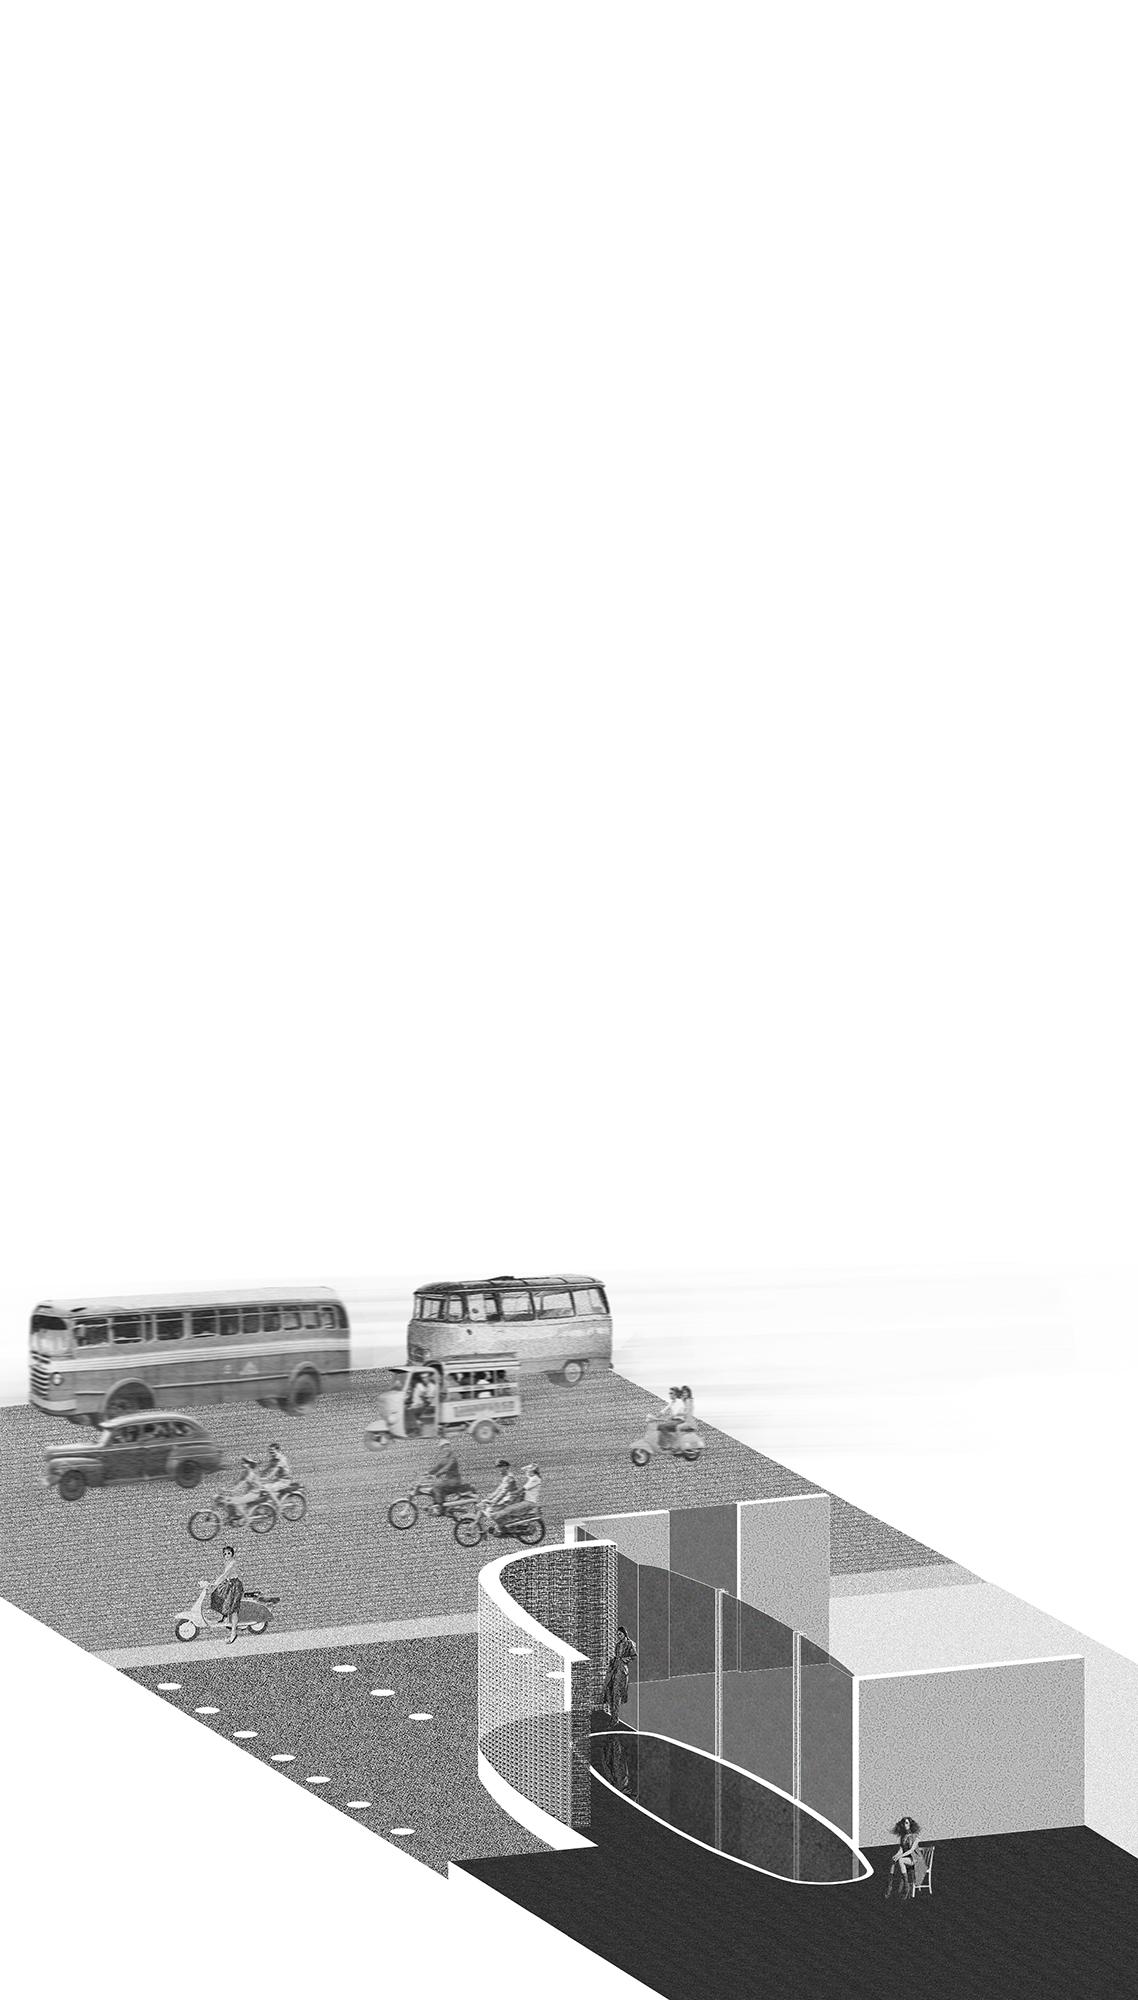 view 3 Model (1)